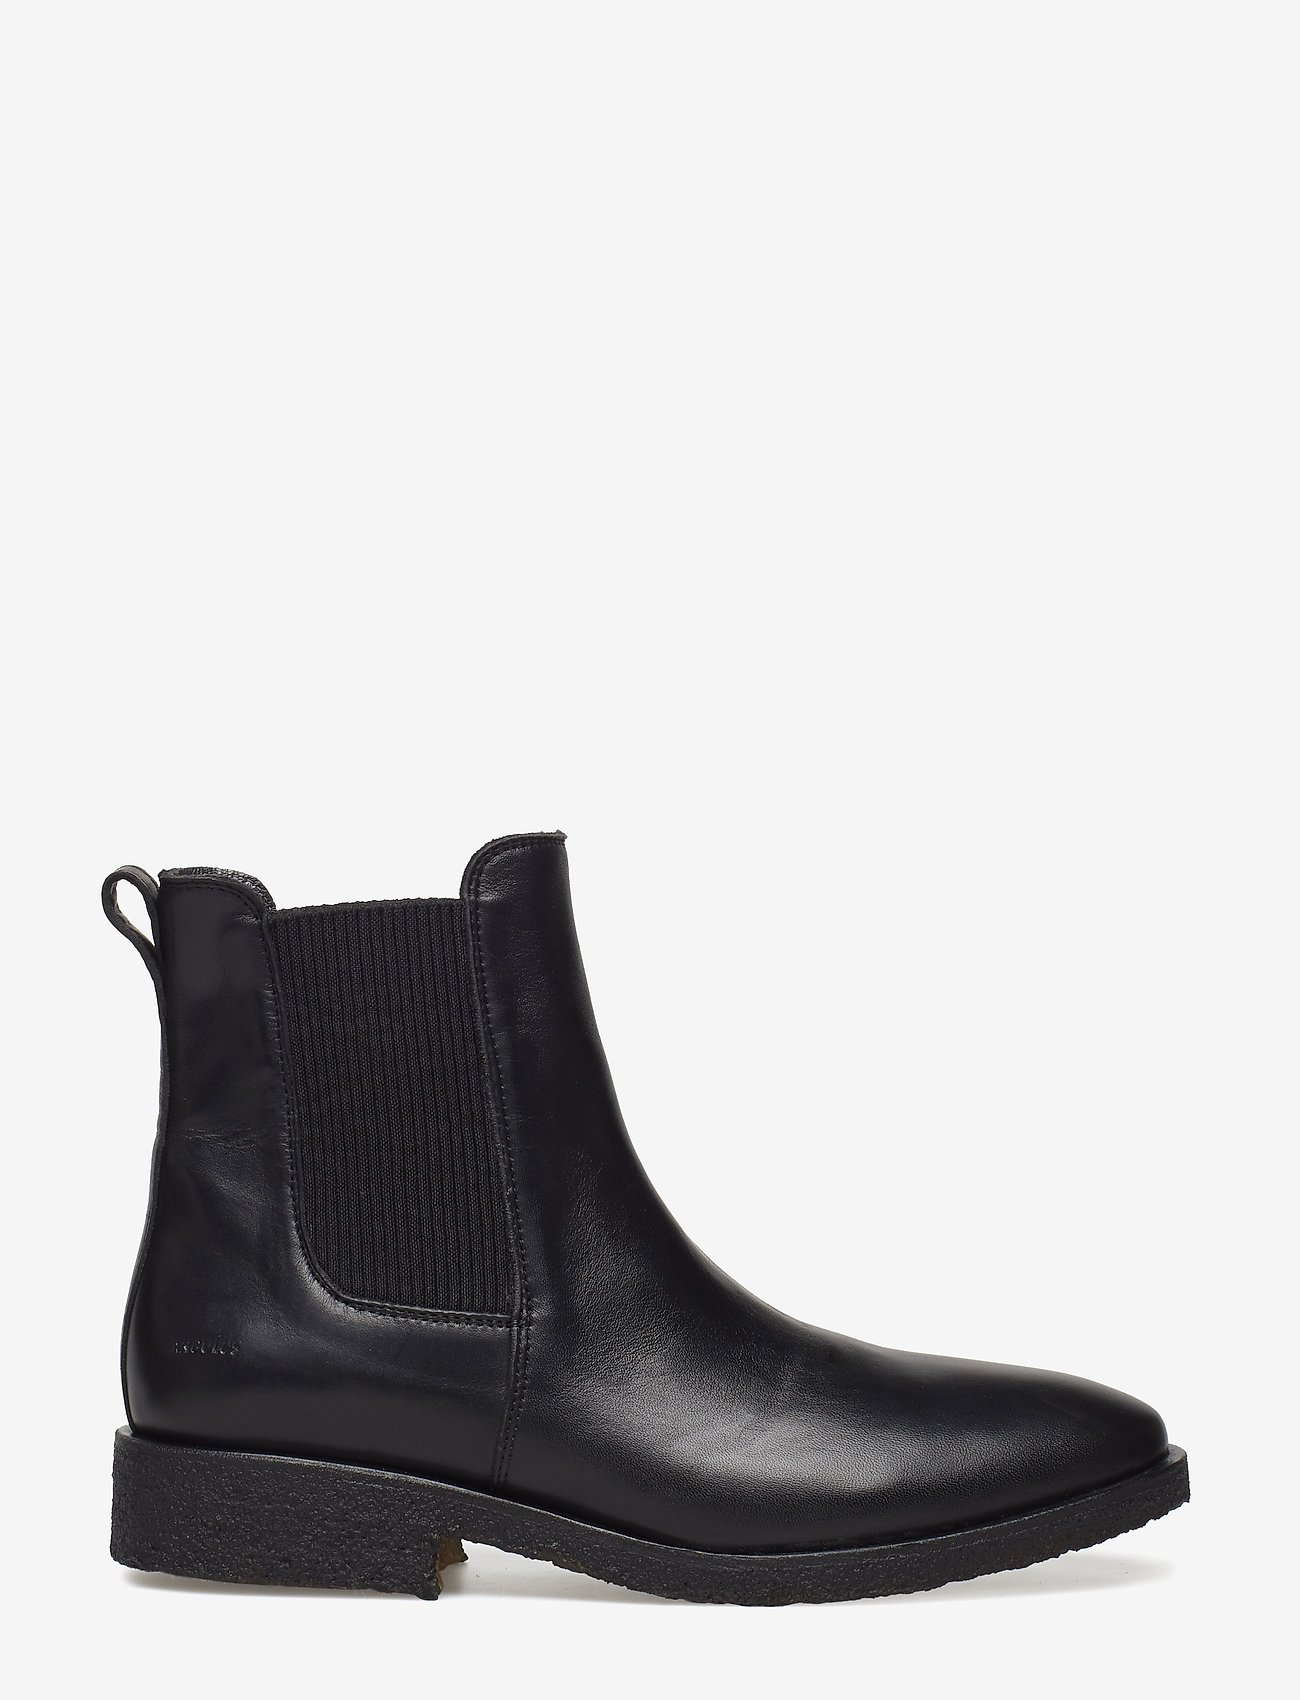 ANGULUS - Booties - flat - with elastic - stiefel - 1604/019 black/black - 1